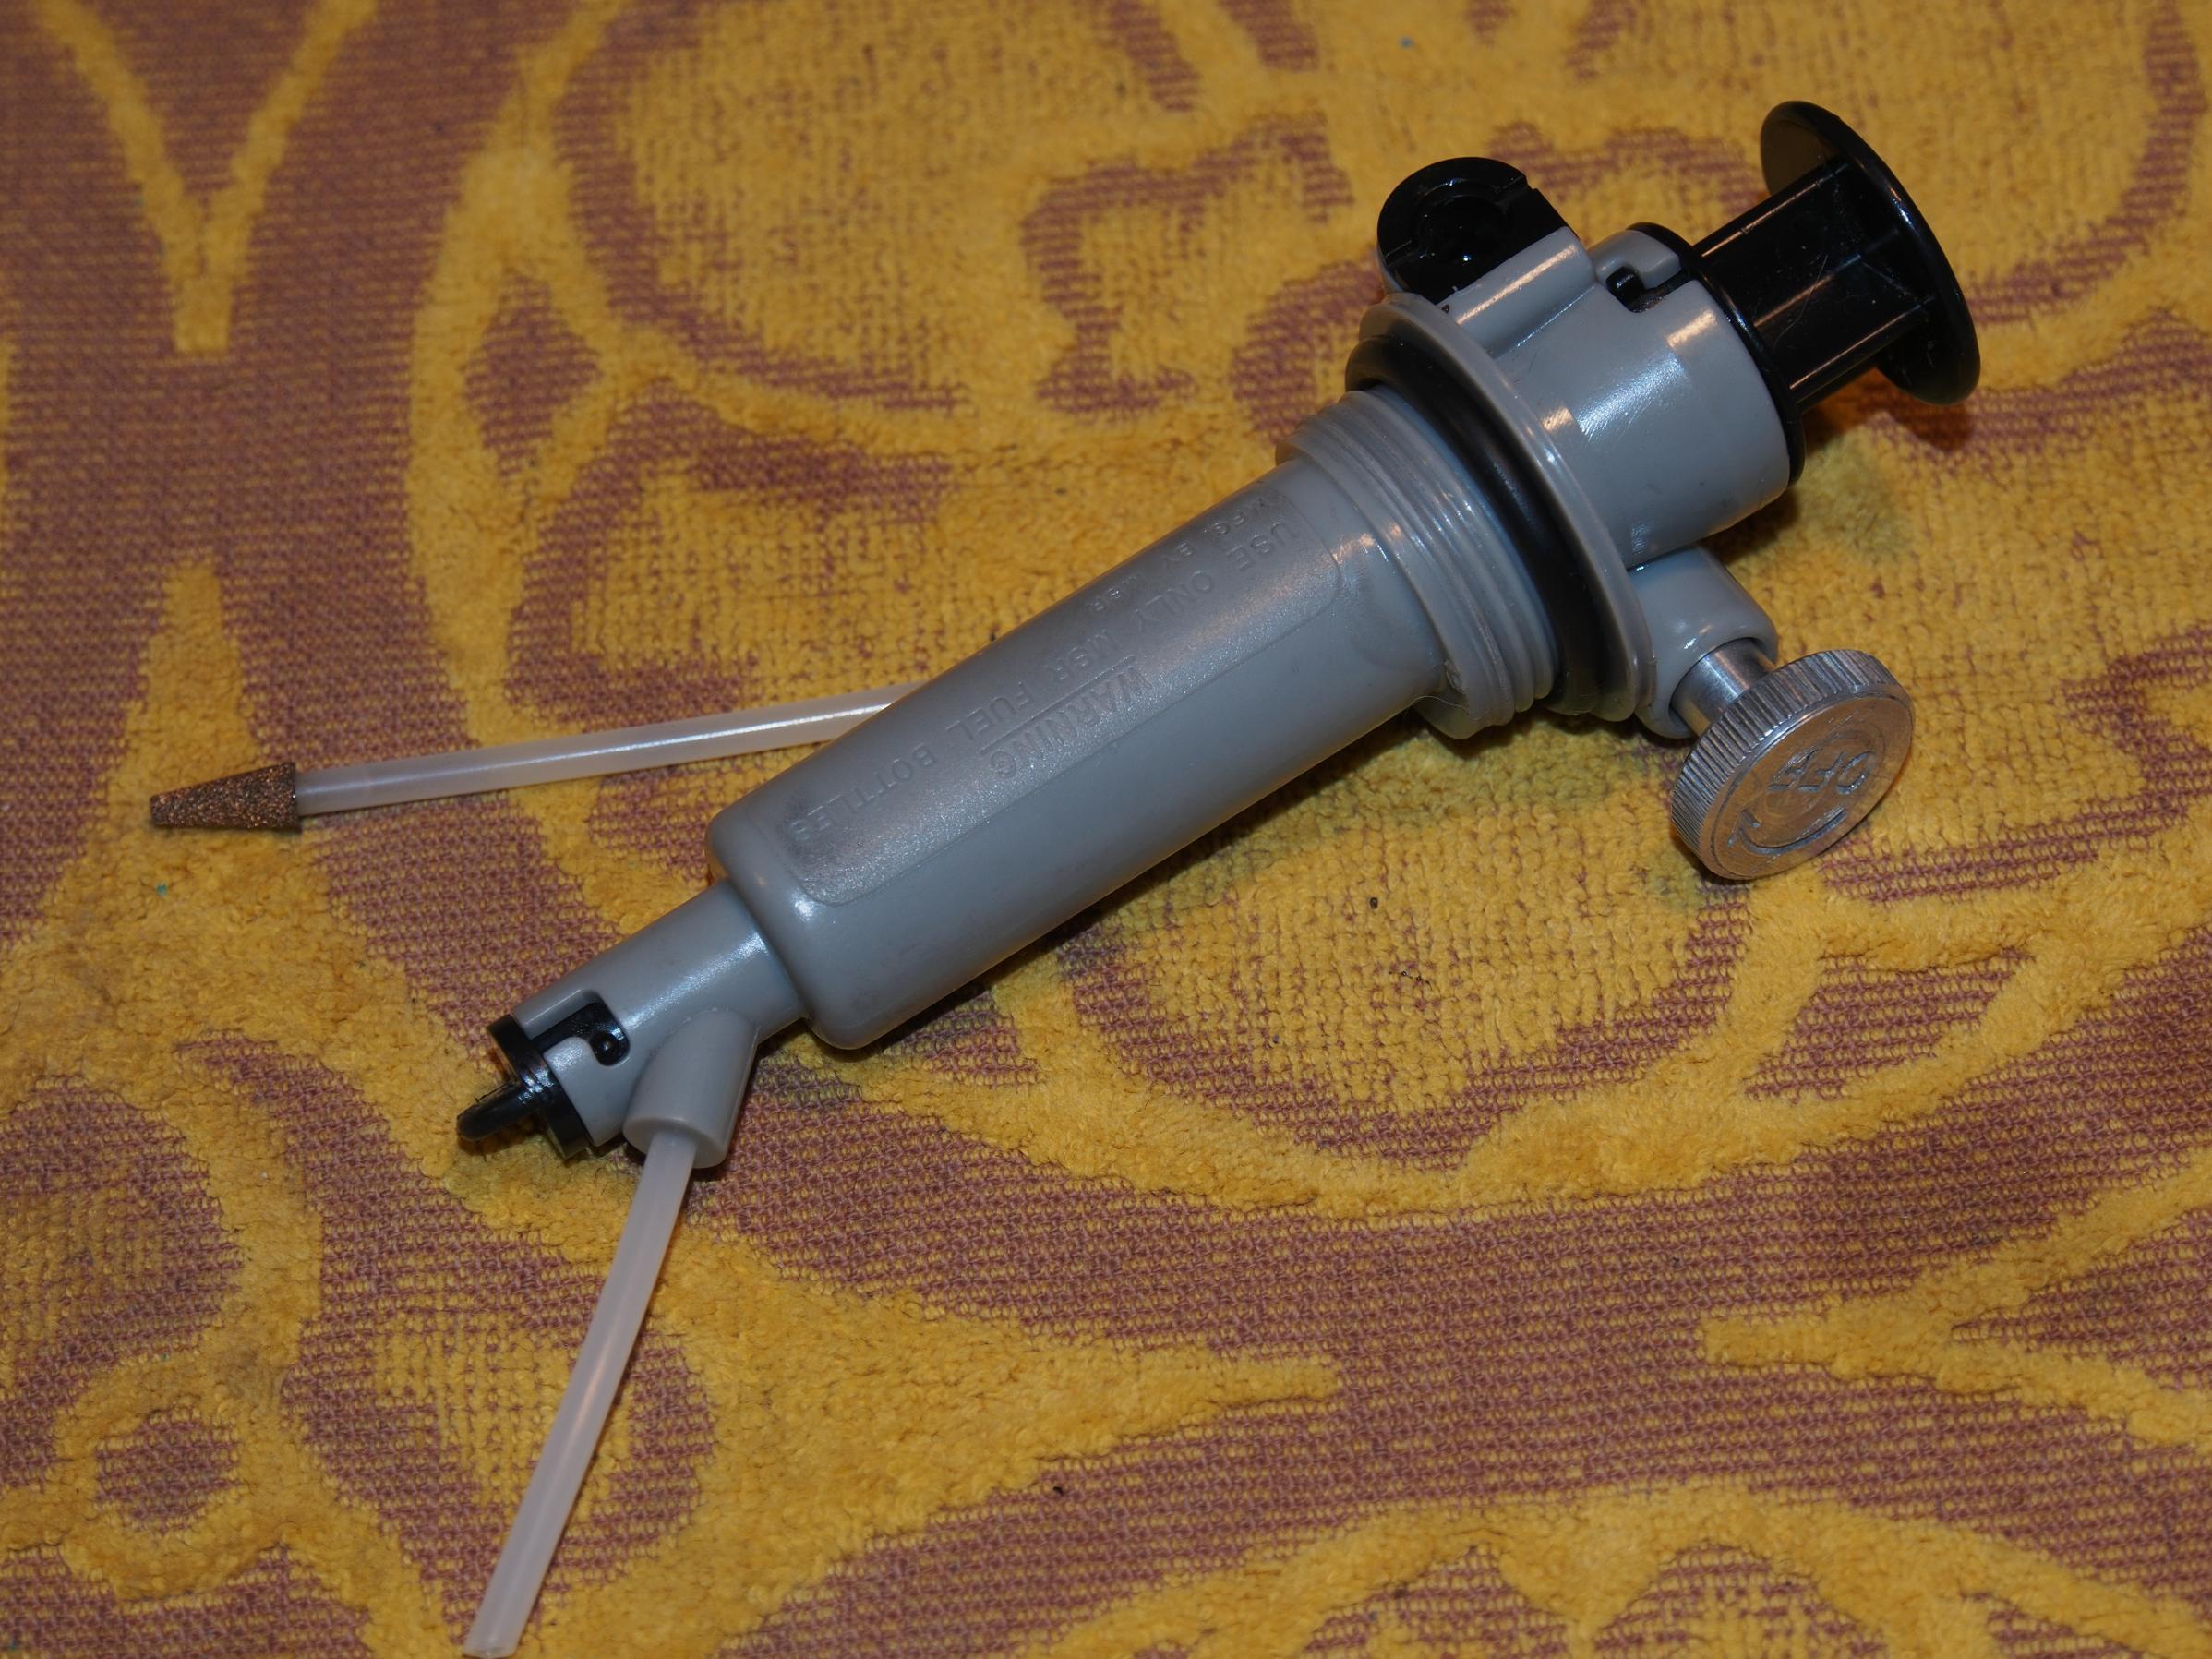 Bwca Msr Fuel Pumps Boundary Waters Gear Forum Pump How Works New Versio Regular With Whisperlite Simmerlite Firefly Xgk